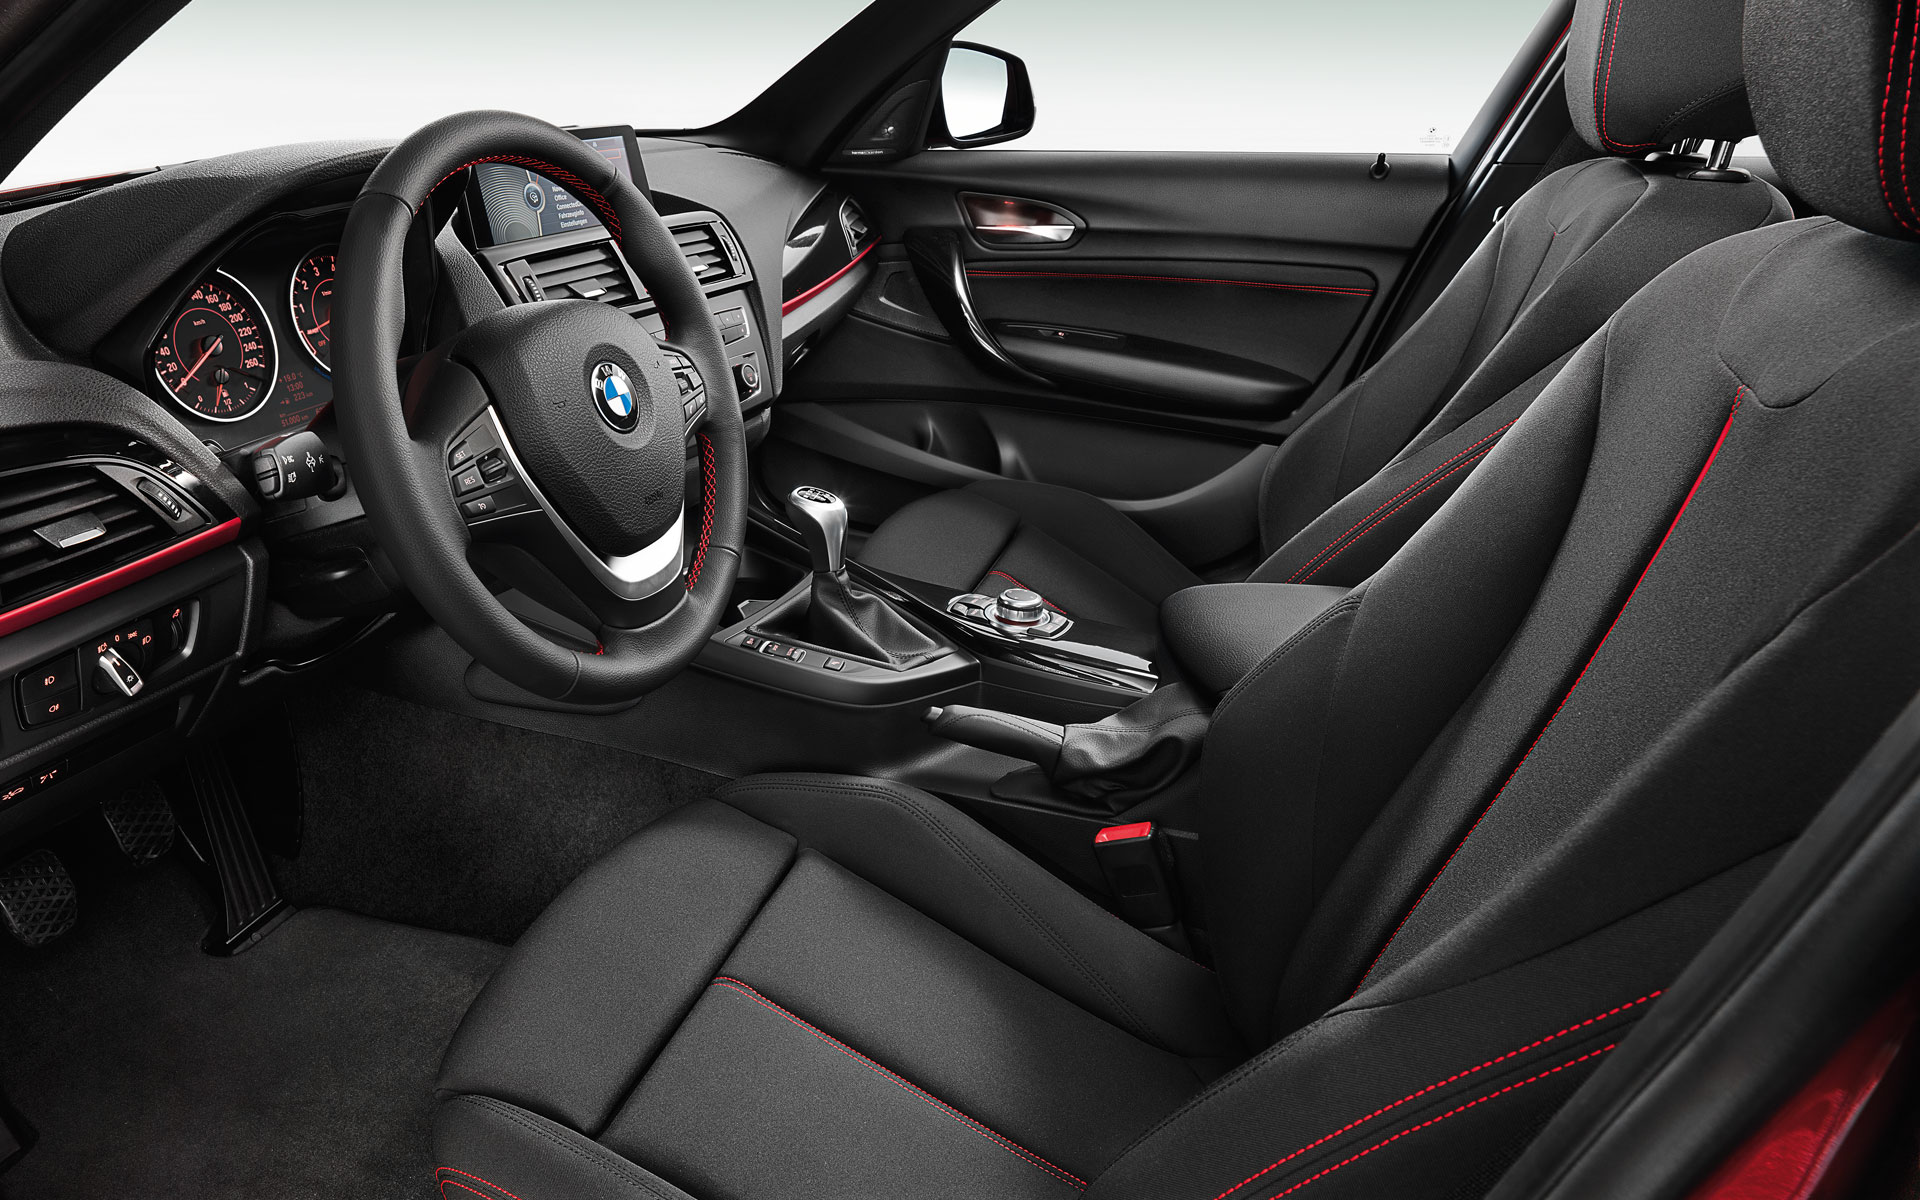 BMW_1series_wallpaper_11_1920_1200.jpg.resource.1373895734384.jpg